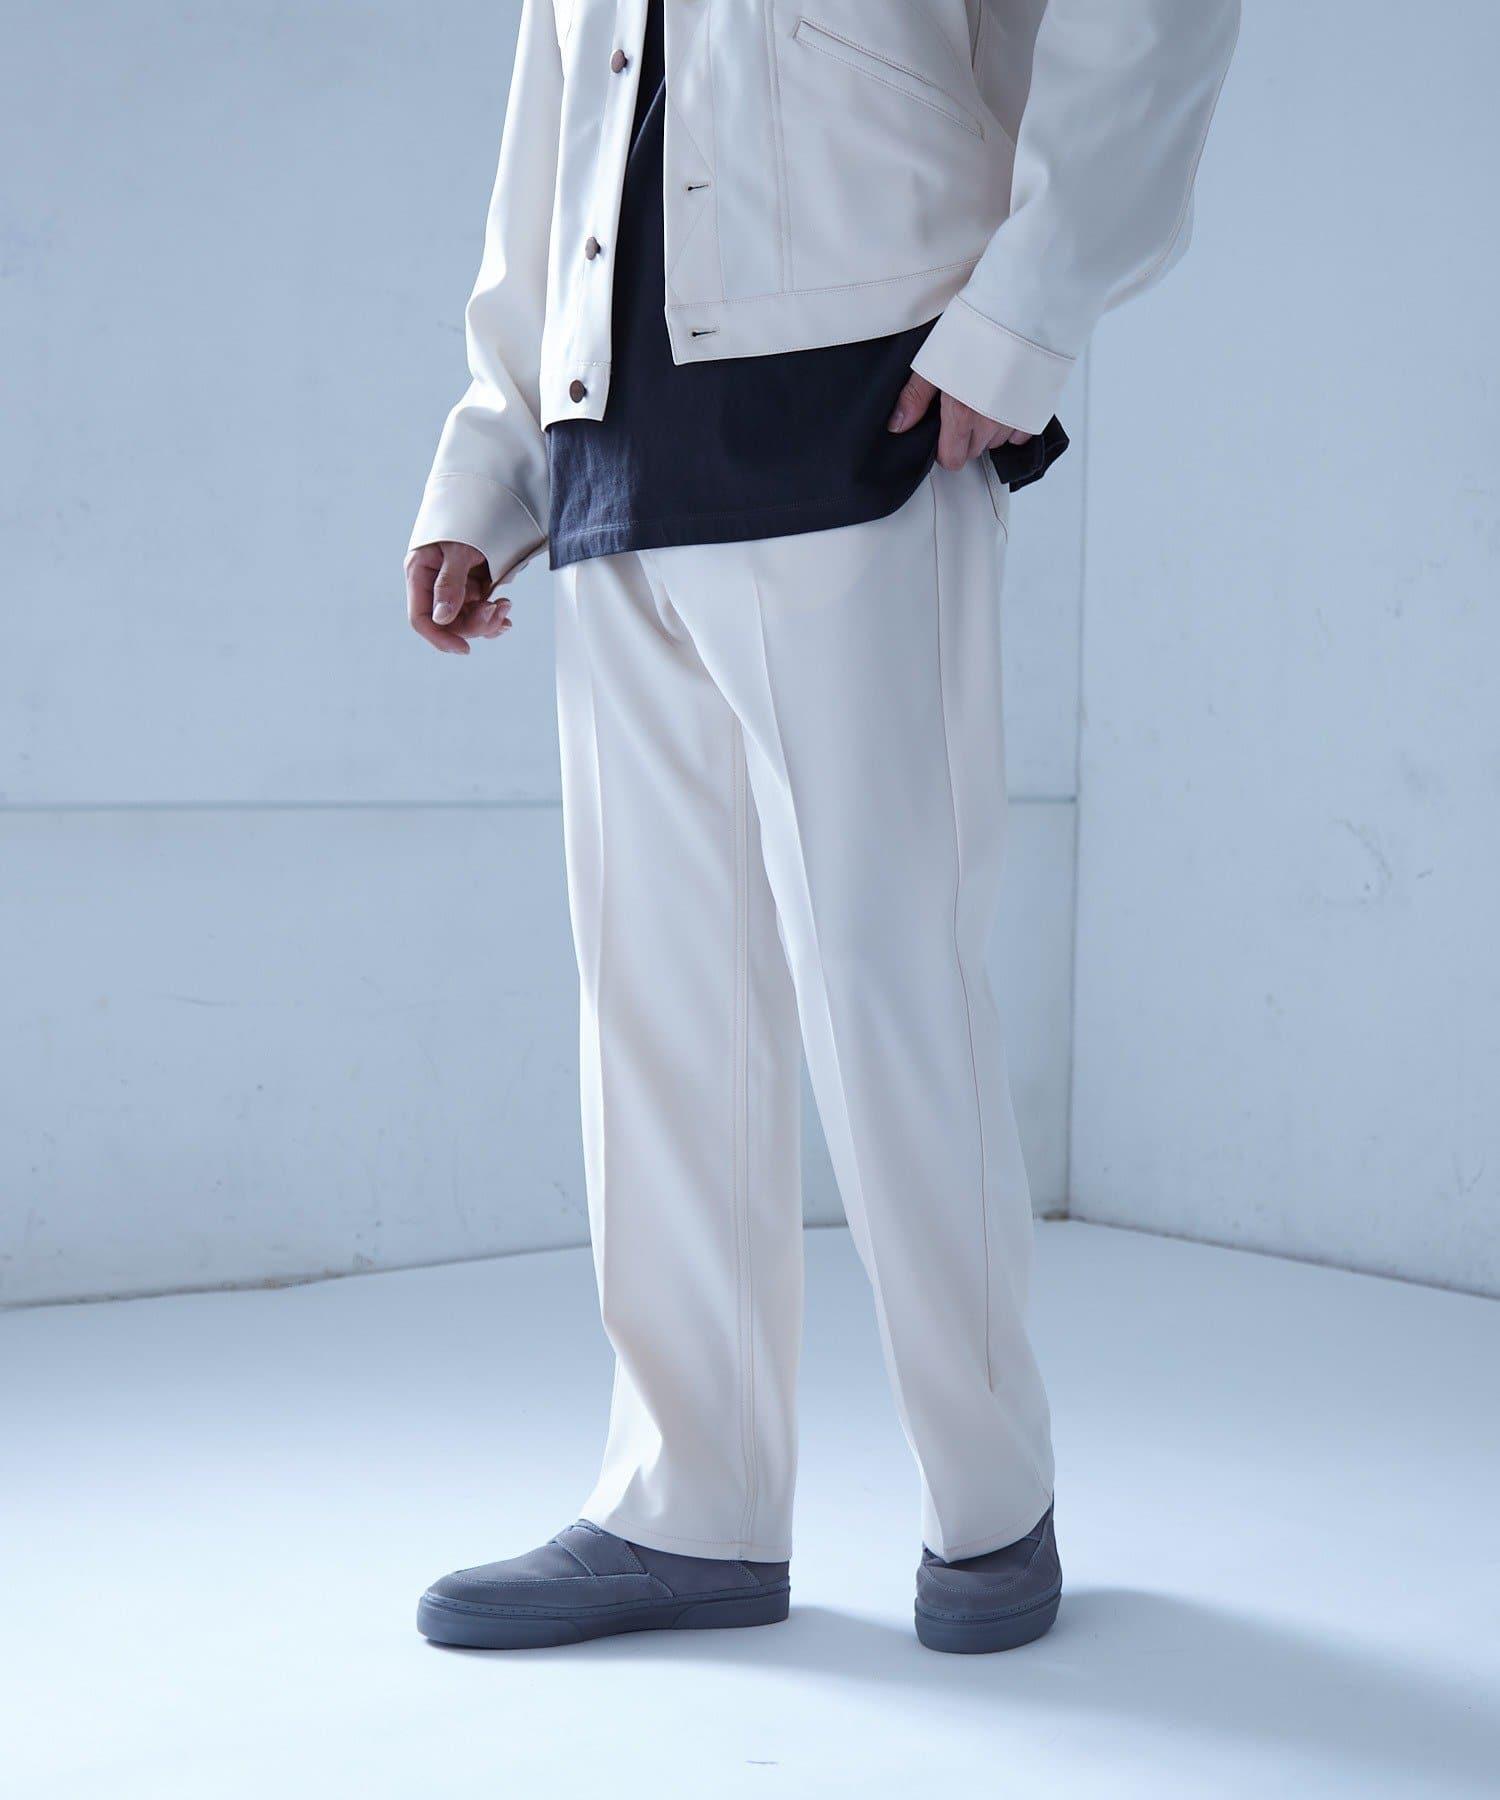 Discoat(ディスコート) メンズ 【Wrangler/ラングラー】 WRANCHER DRESS オフホワイト